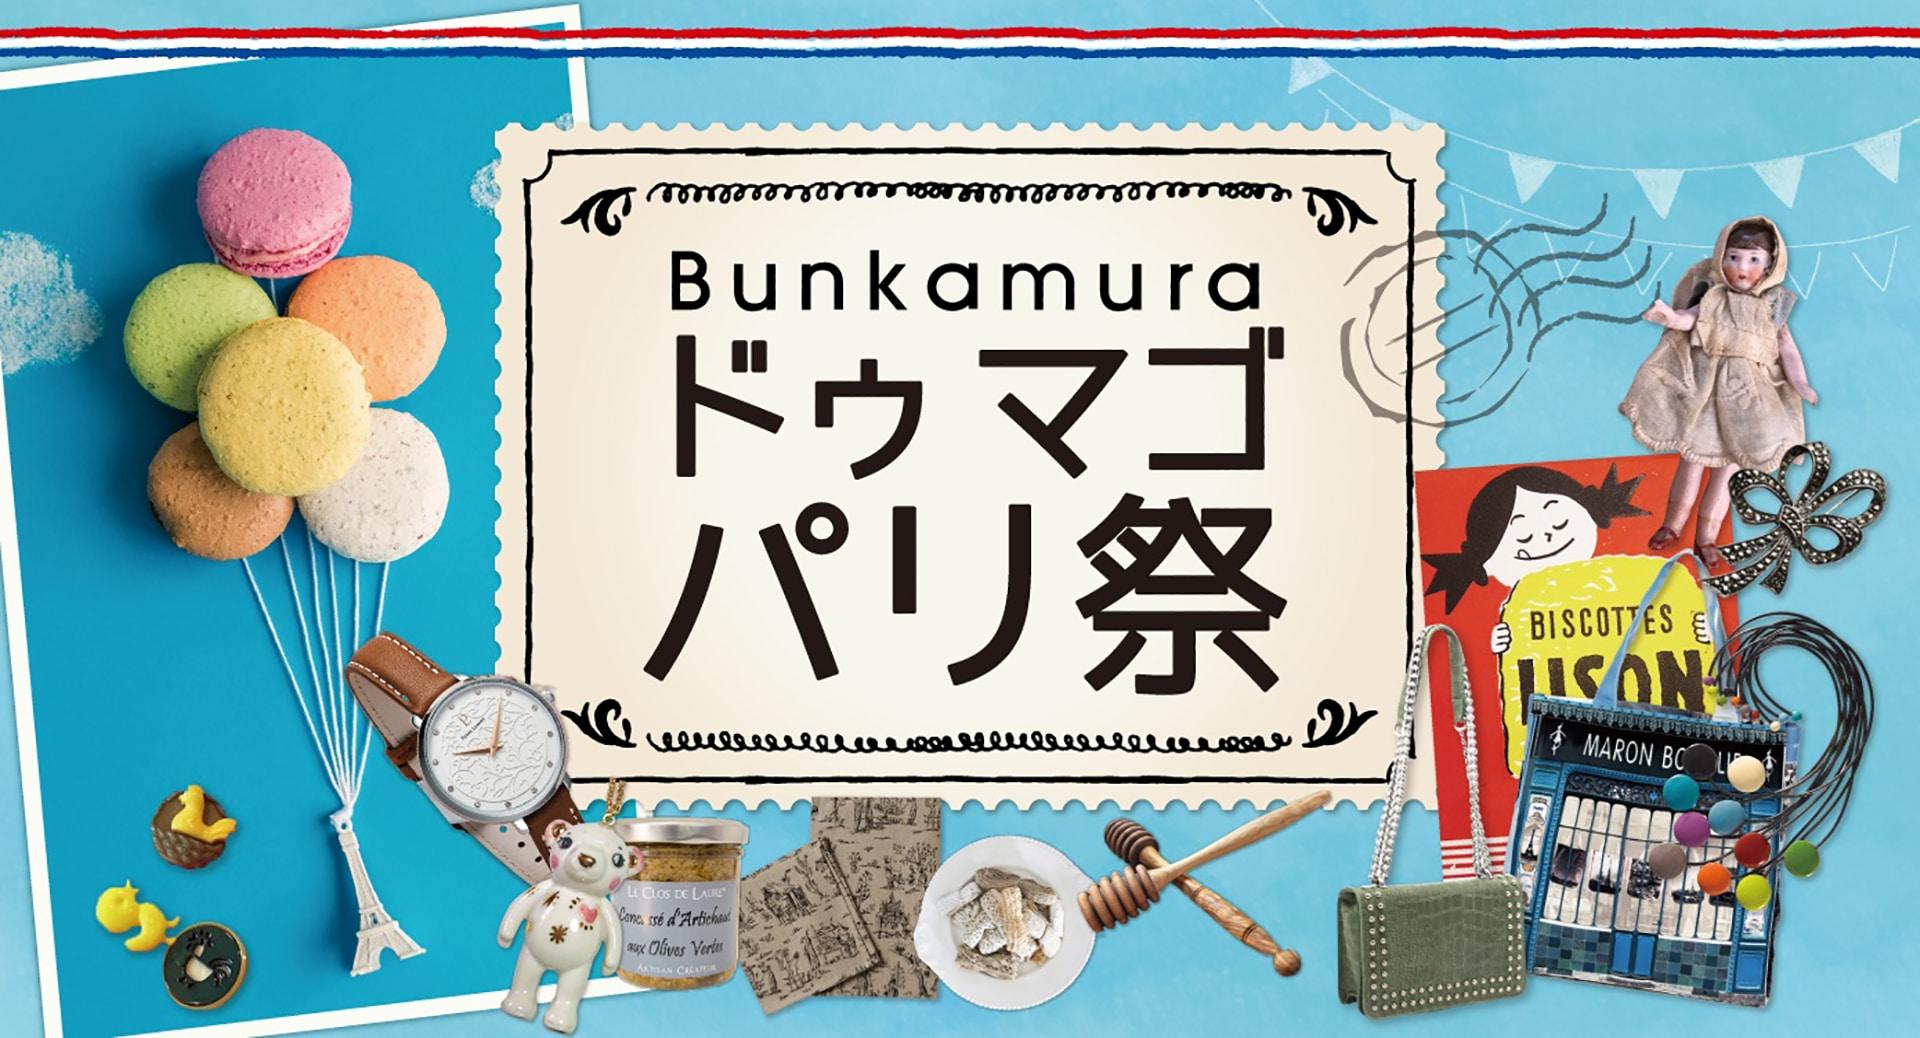 Bunkamura ドゥ マゴ パリ祭